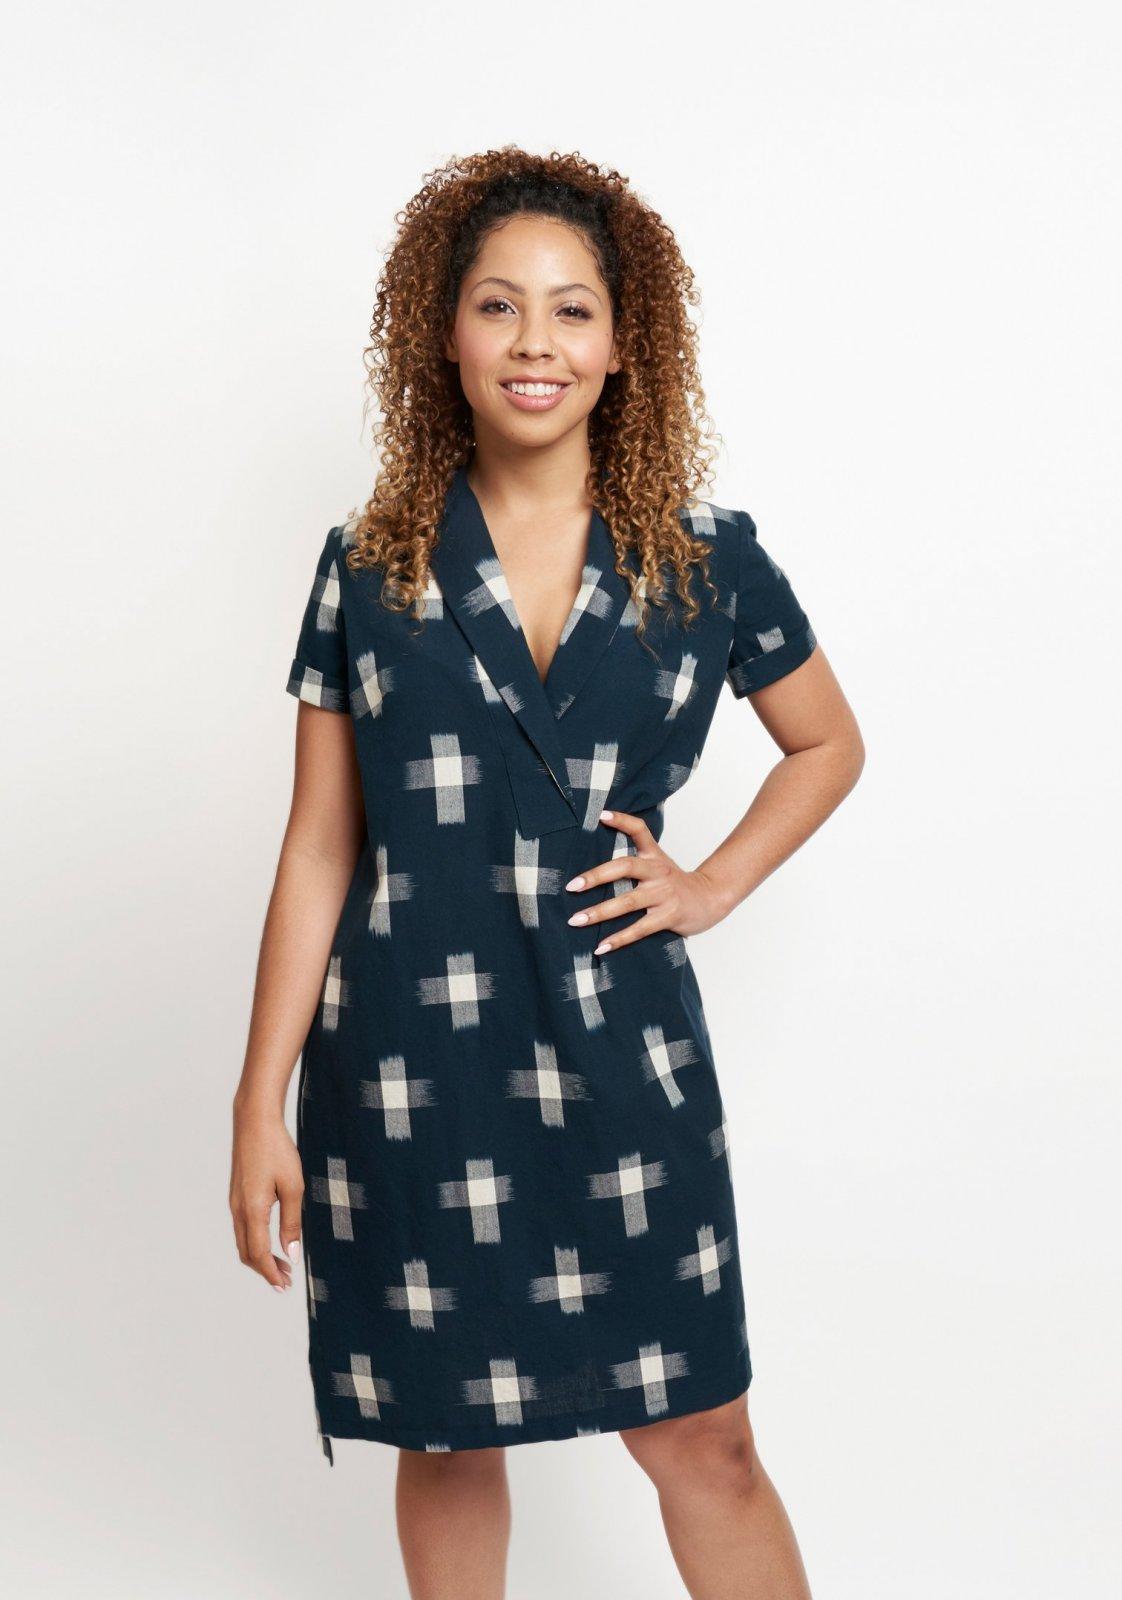 Grainline Studio Augusta Shirt & Dress Pattern - Sizes 0-18 or 14-30